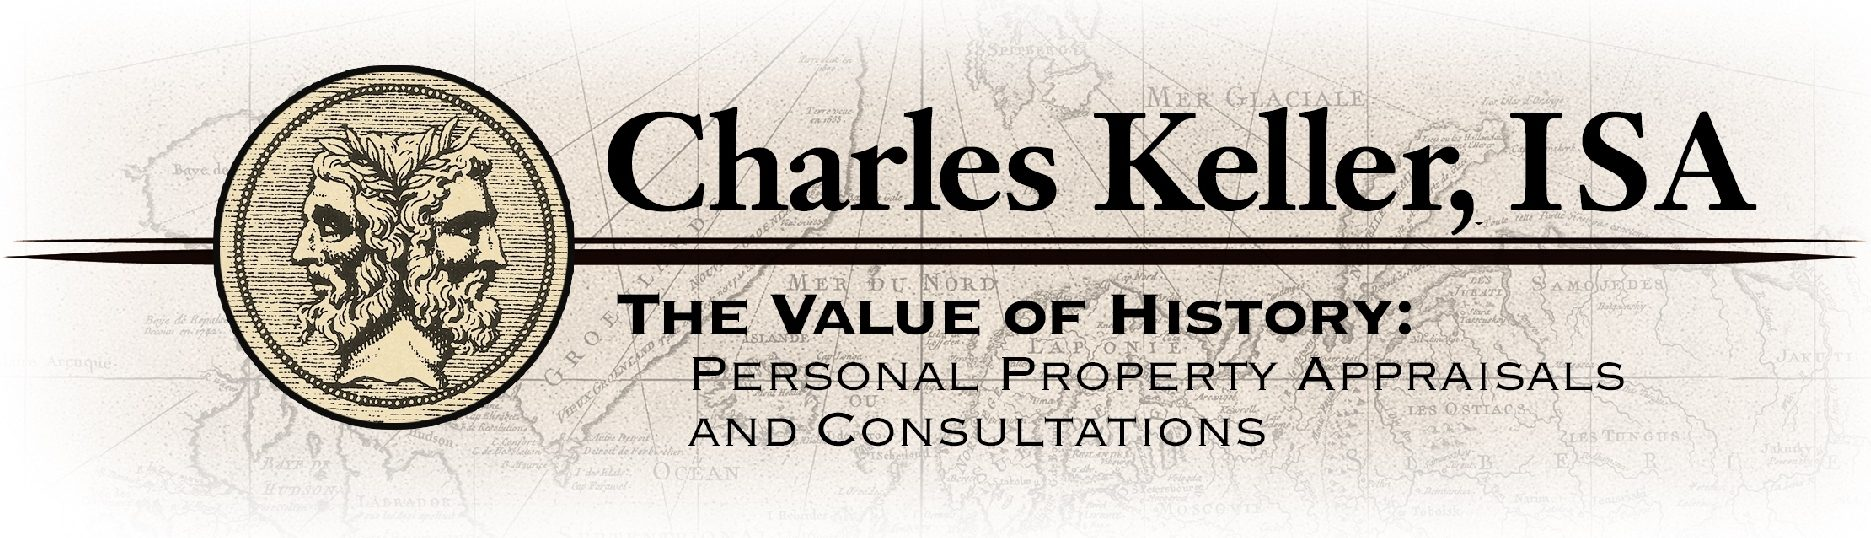 Charles Keller Appraisals